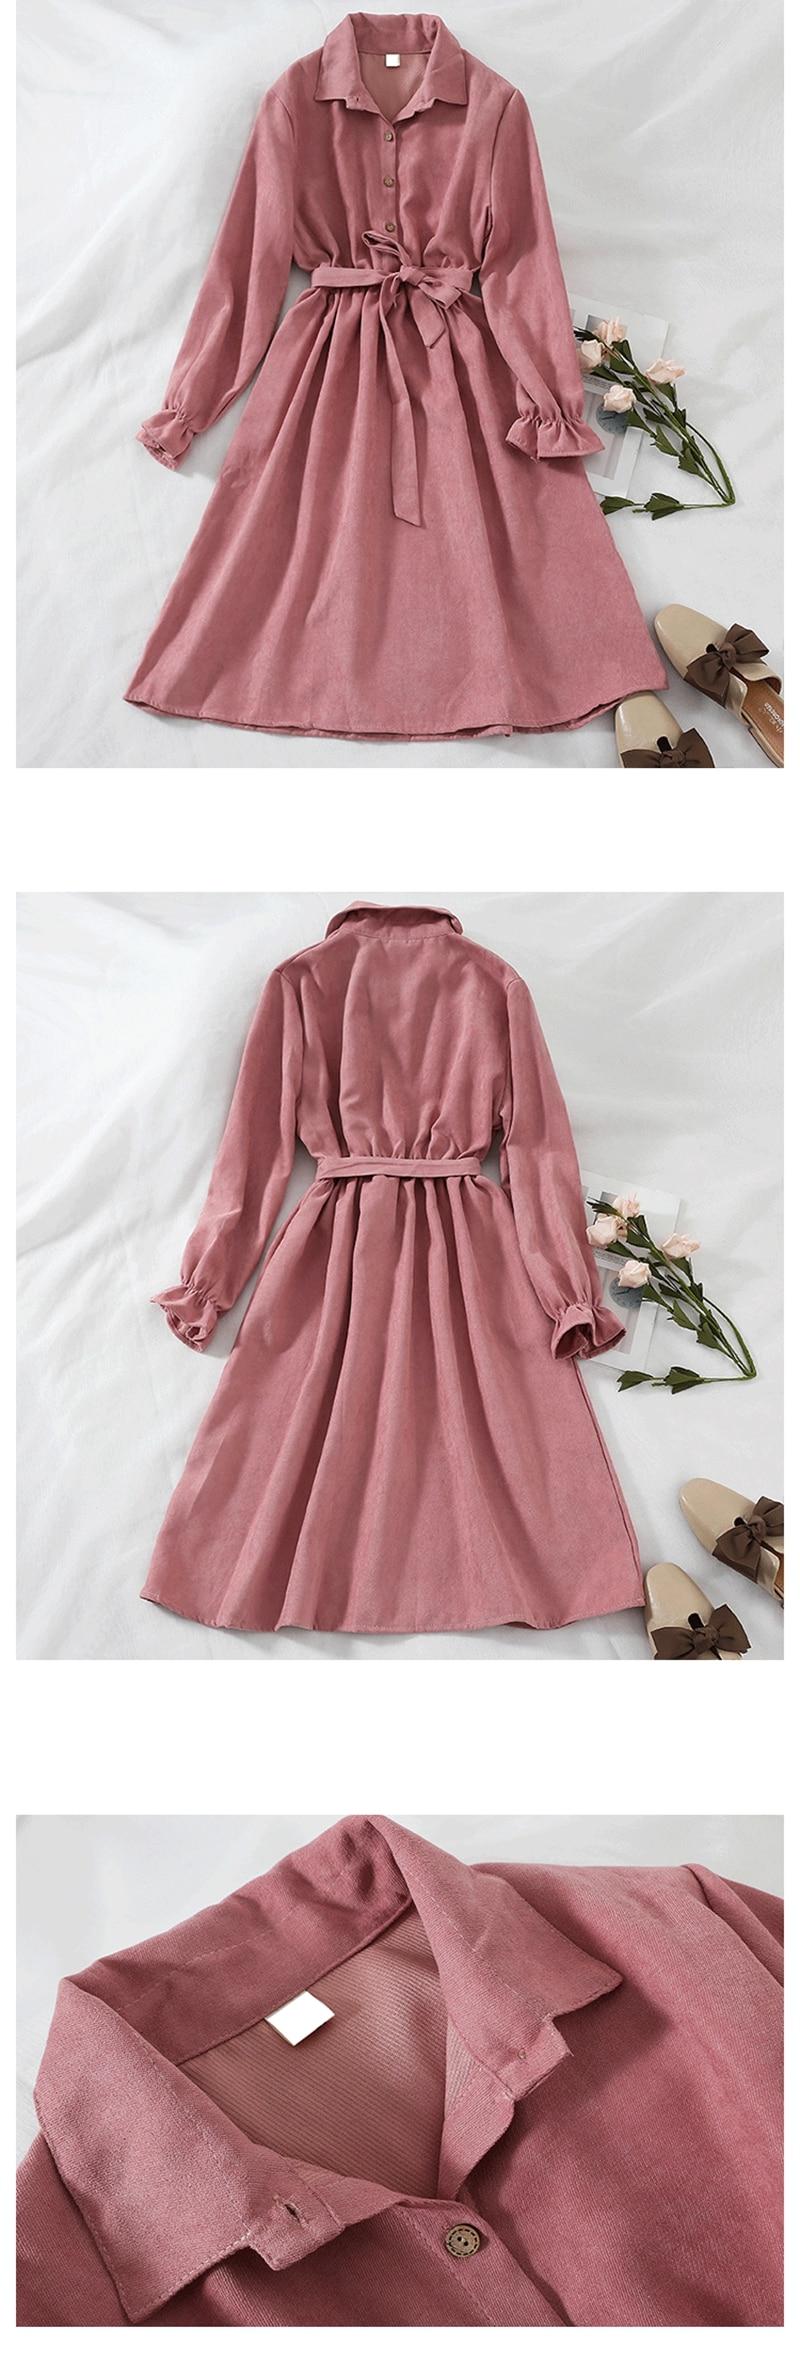 Mferlier Winter Dress Women Turn Down Collar Long Flare Sleeve Sashes High Waist Mori Girl 5 Solid Colors Vintage Shirt Dress 6